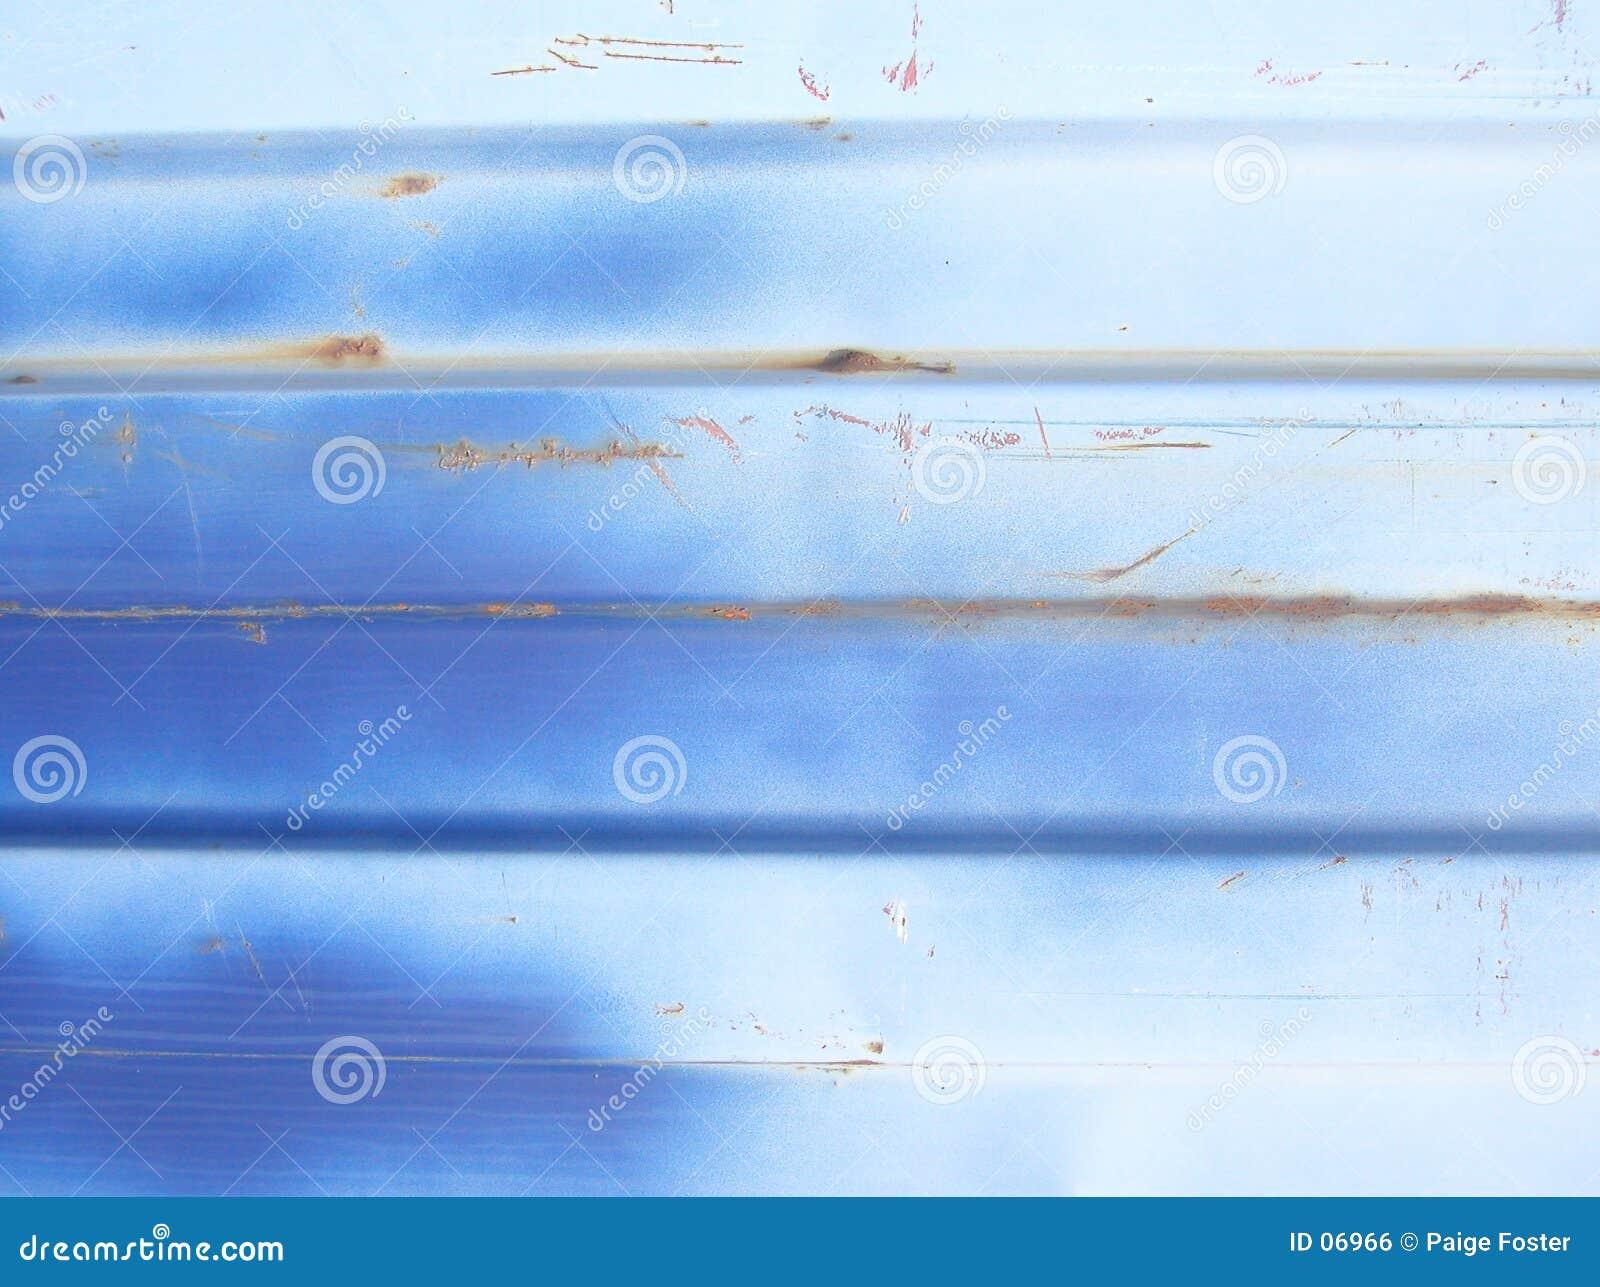 Niebieski abstrakcyjne metalu